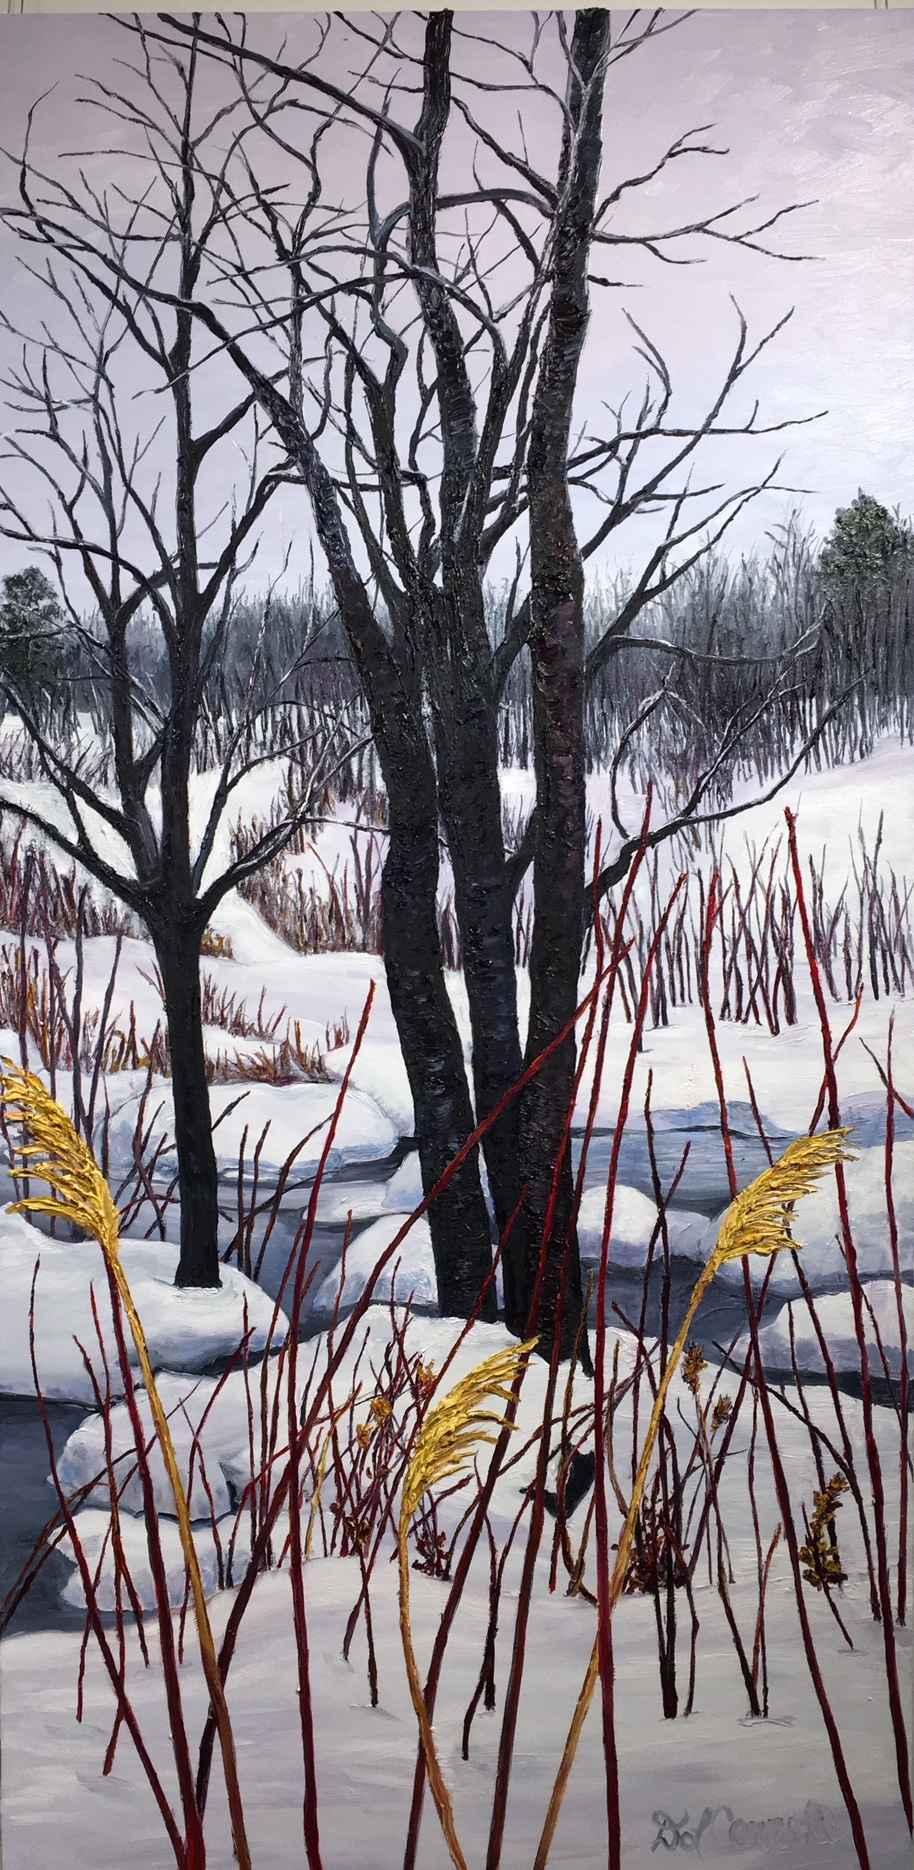 Brightening A Winter ... by Ms Debra Lynn Carroll - Masterpiece Online